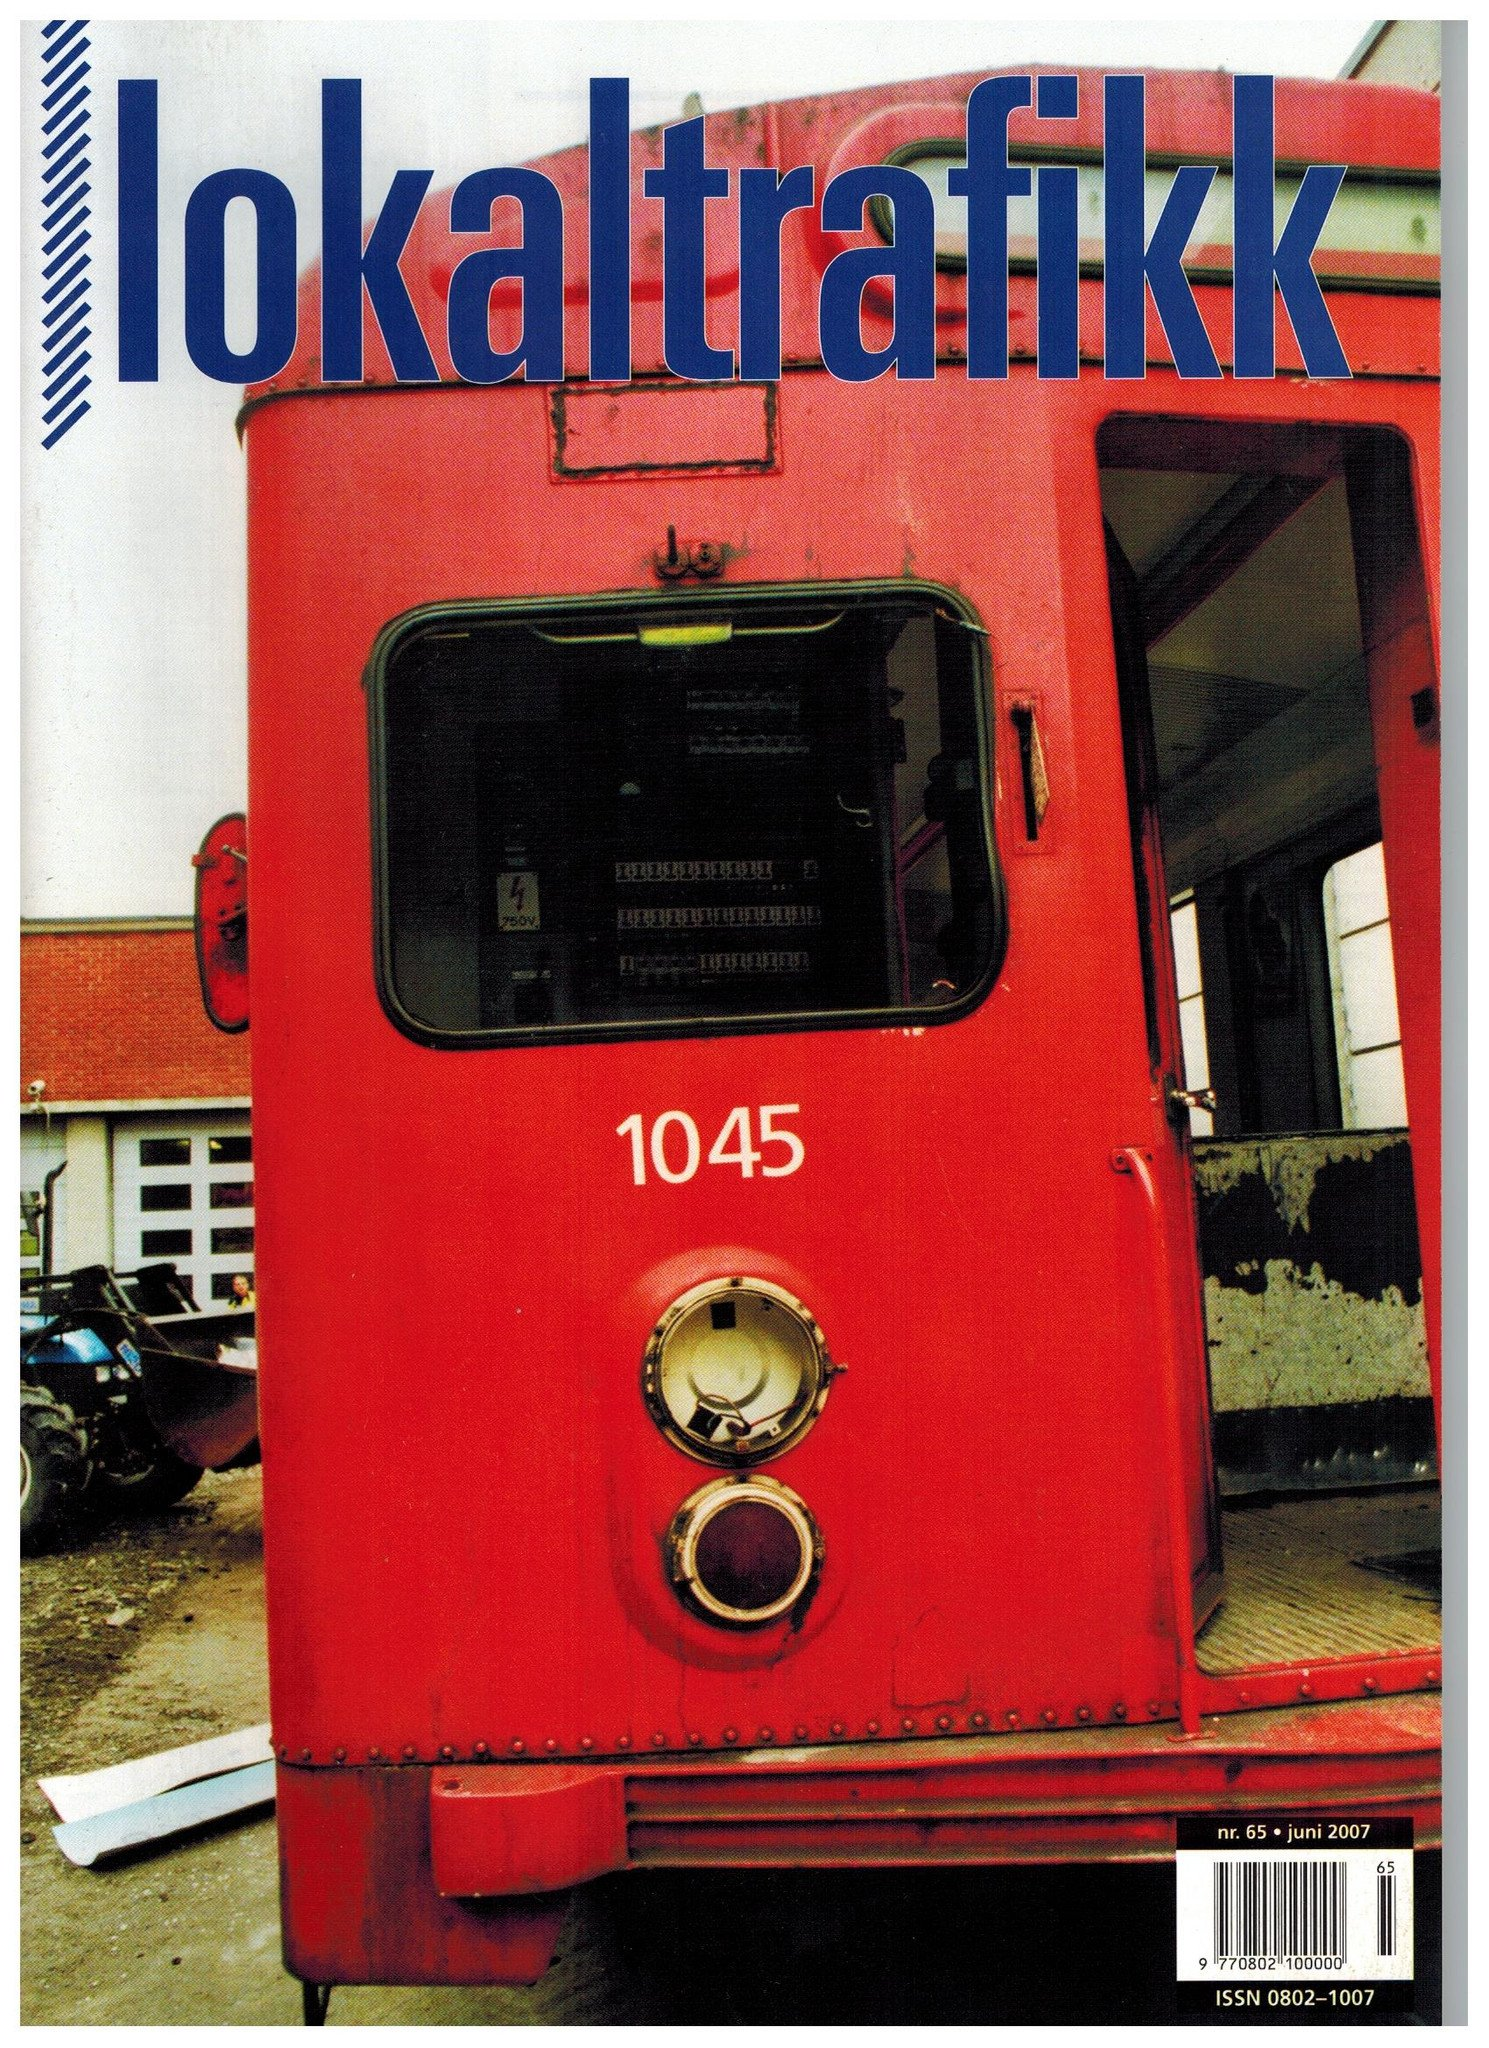 Lokaltrafikk #065